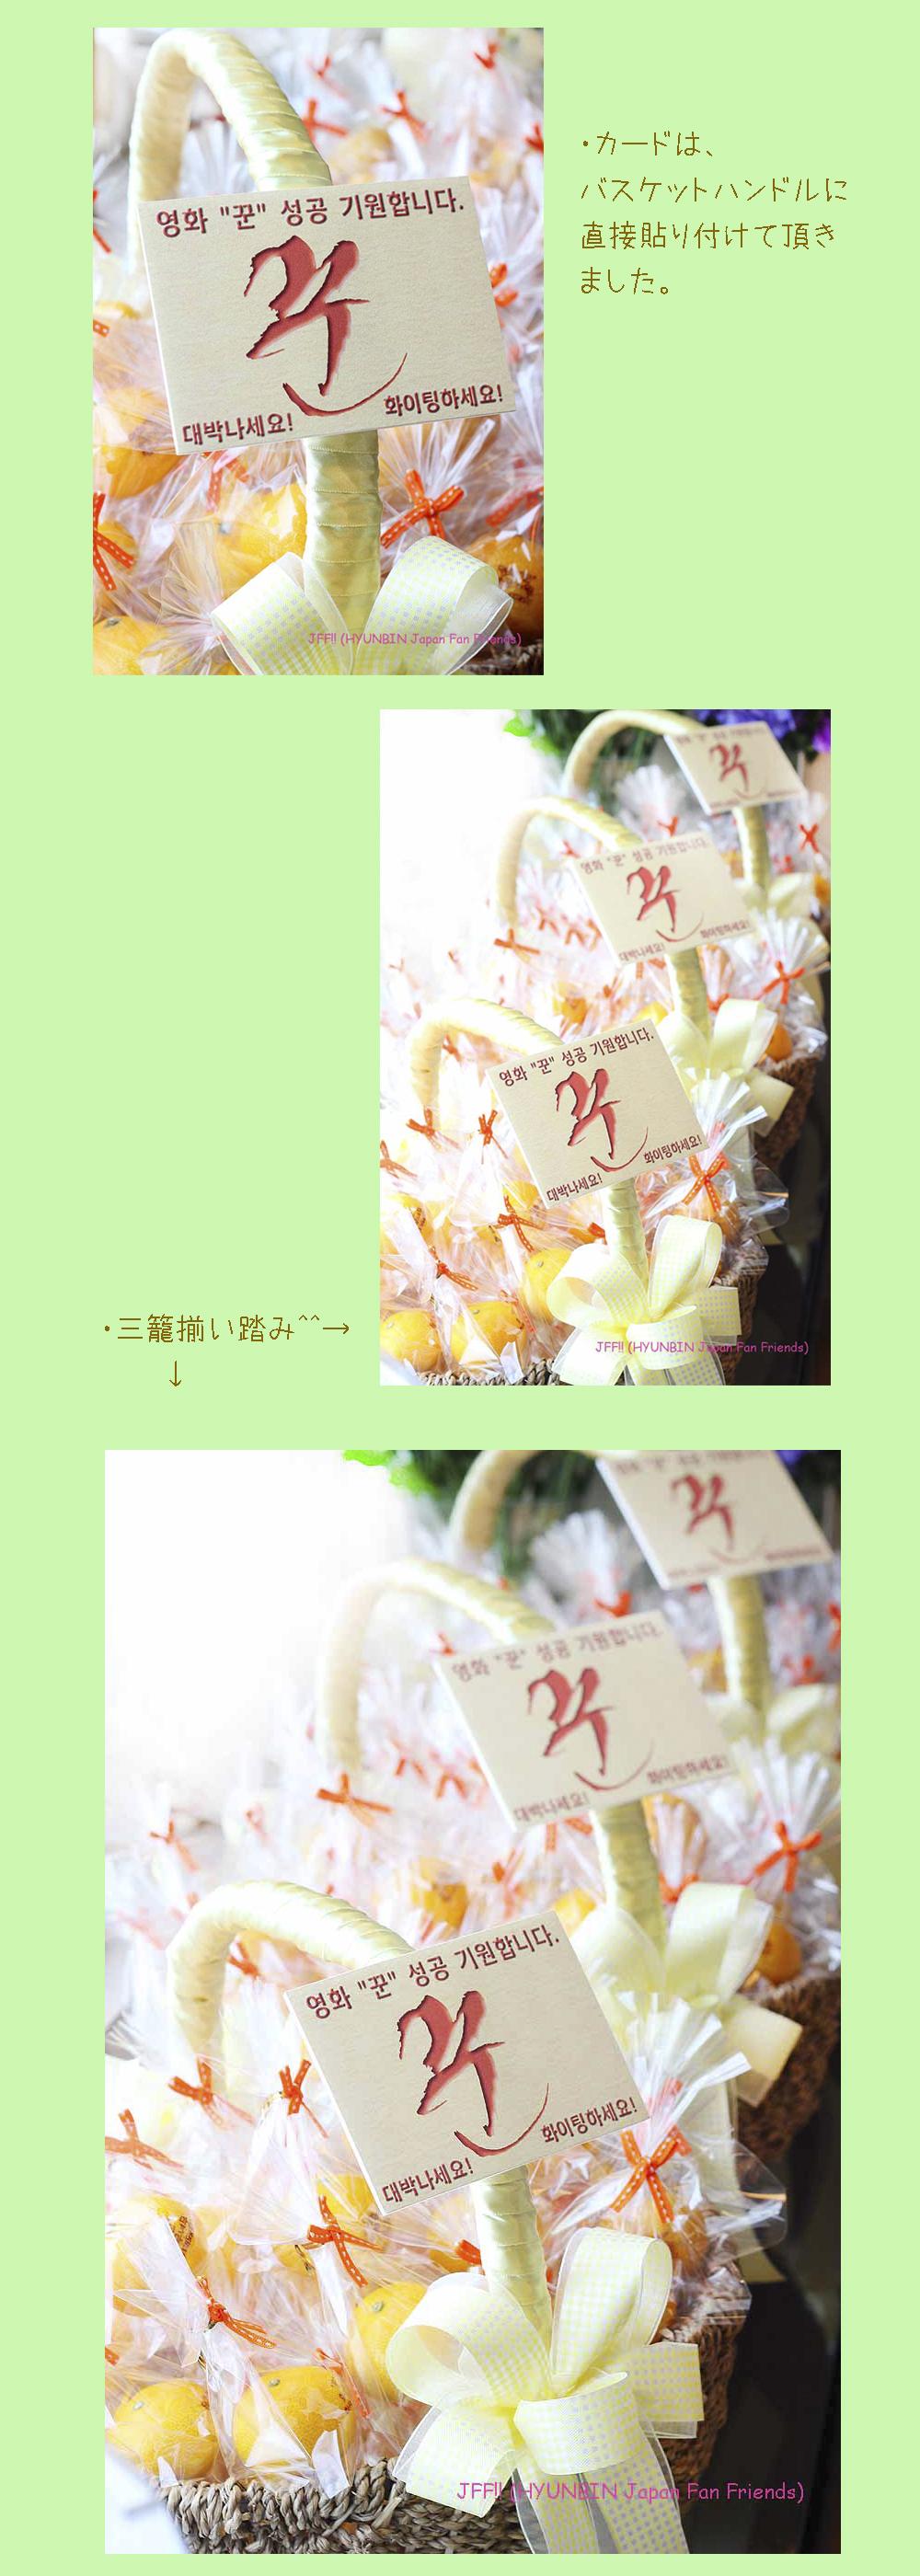 20160926_mikan_04.jpg